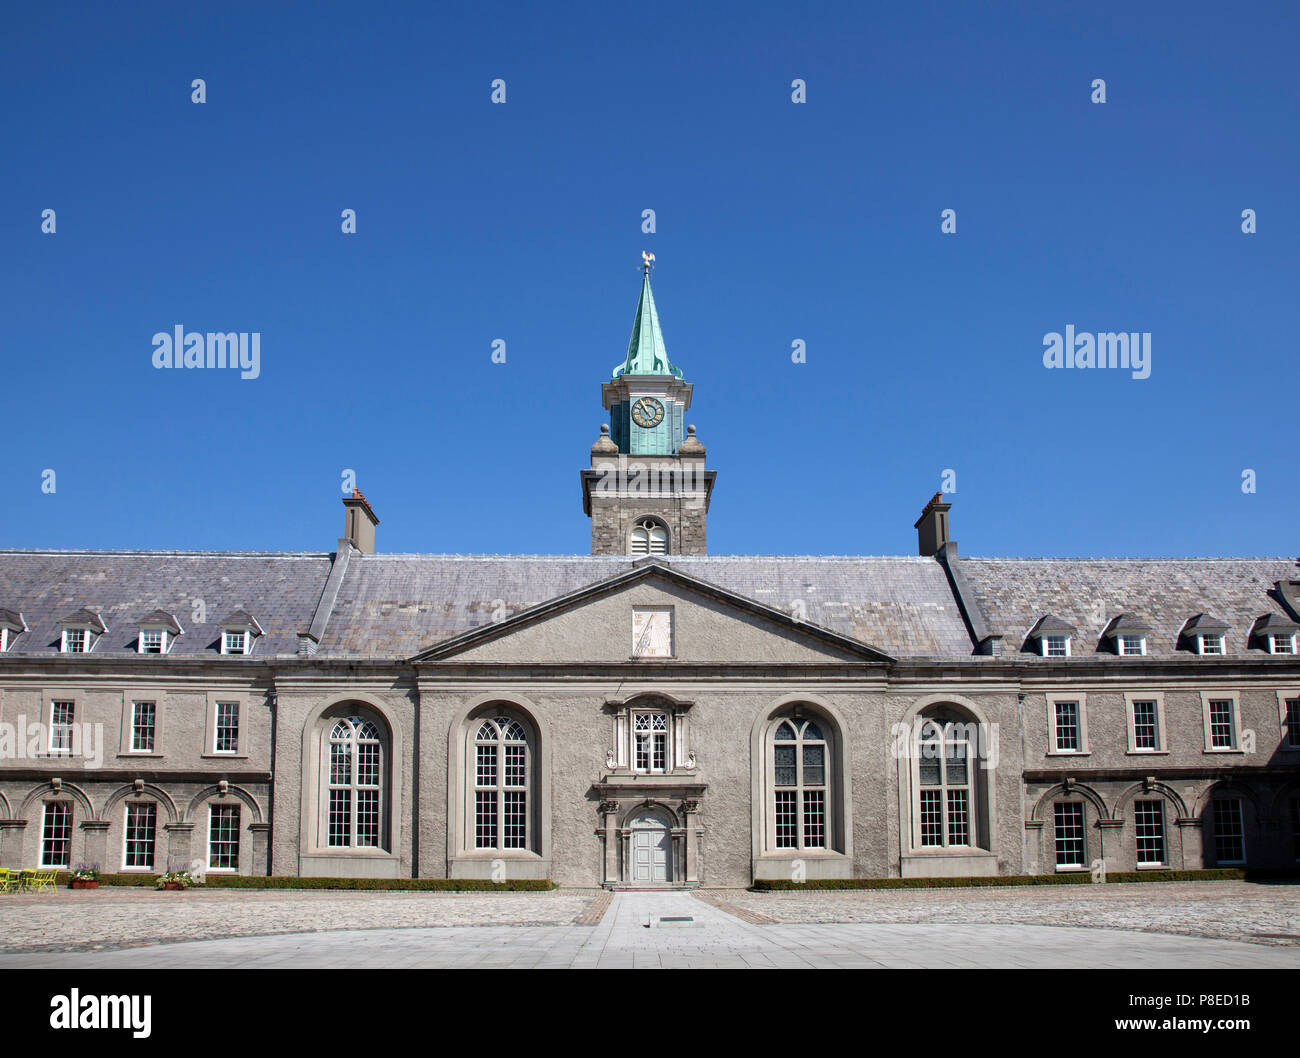 The clock tower of the Royal Hospital, Kilmainham, Dublin, now home to the Irish Museum of Modern Art - Stock Image